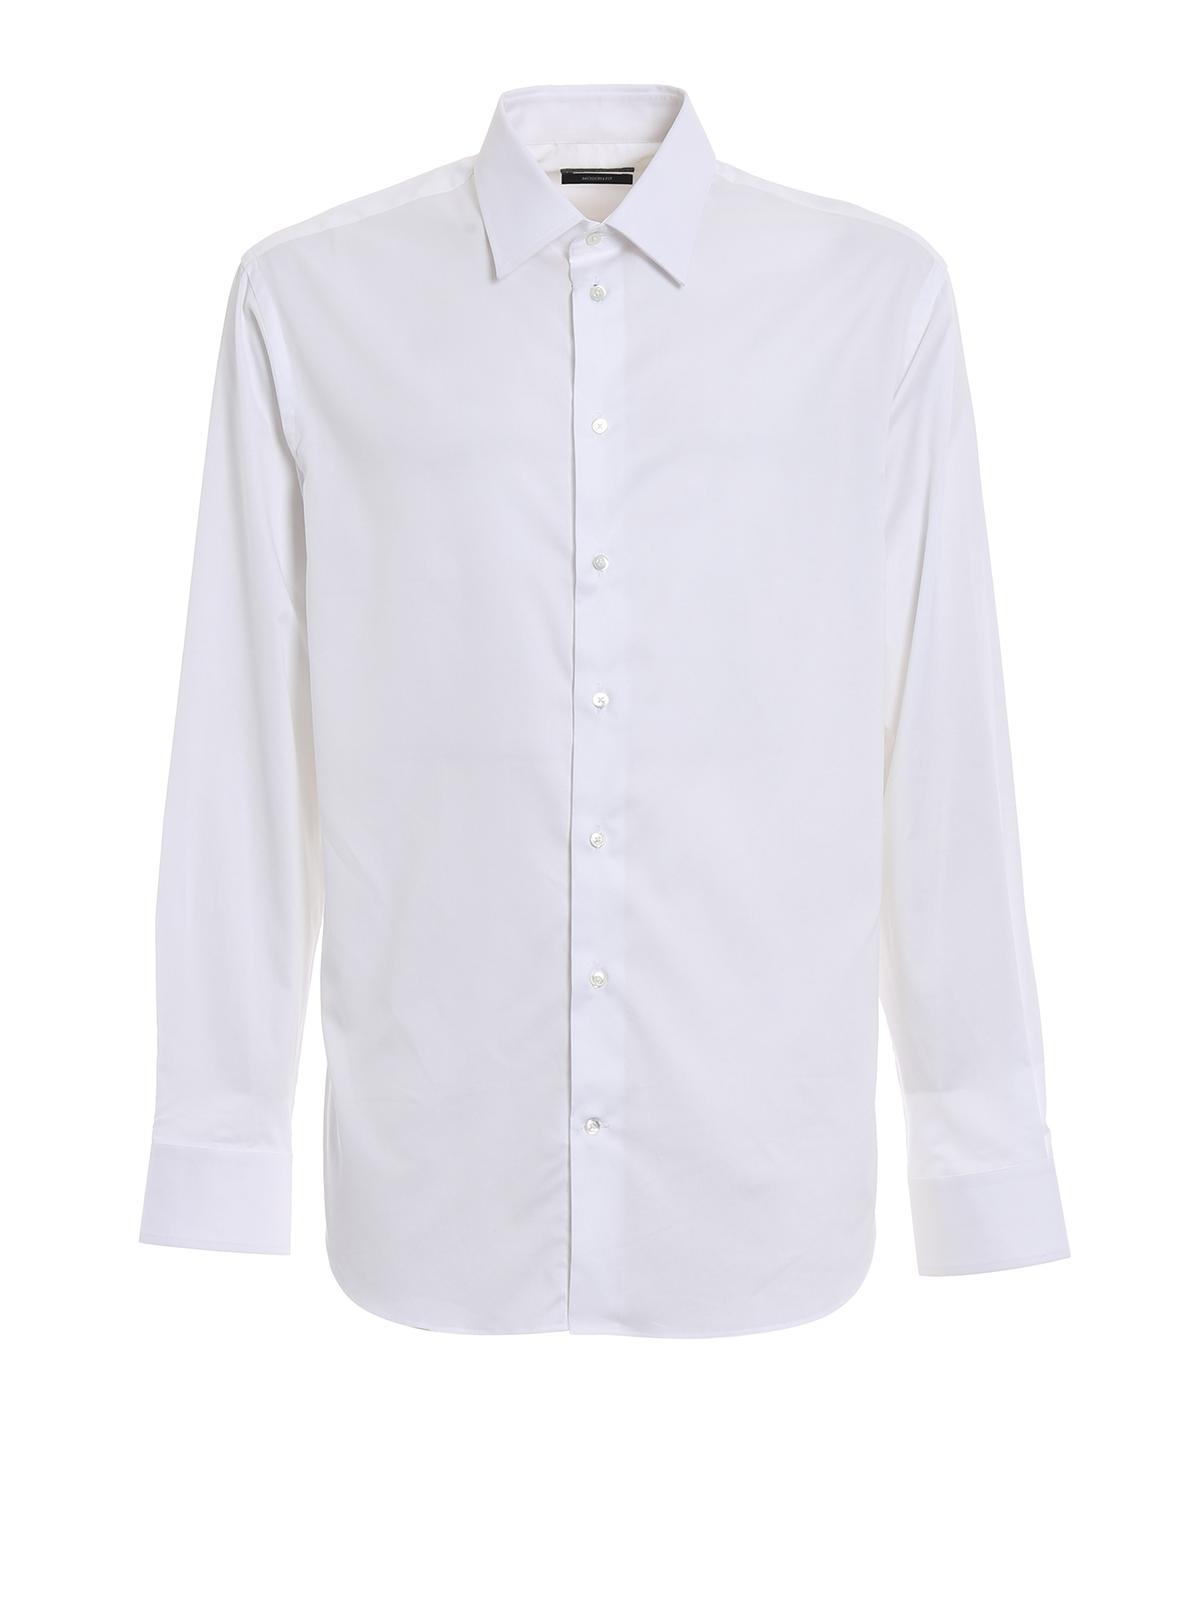 Camisas Armani Modern Camisa Fit W1cm5lw1c45100 Emporio SxI0Uq77w